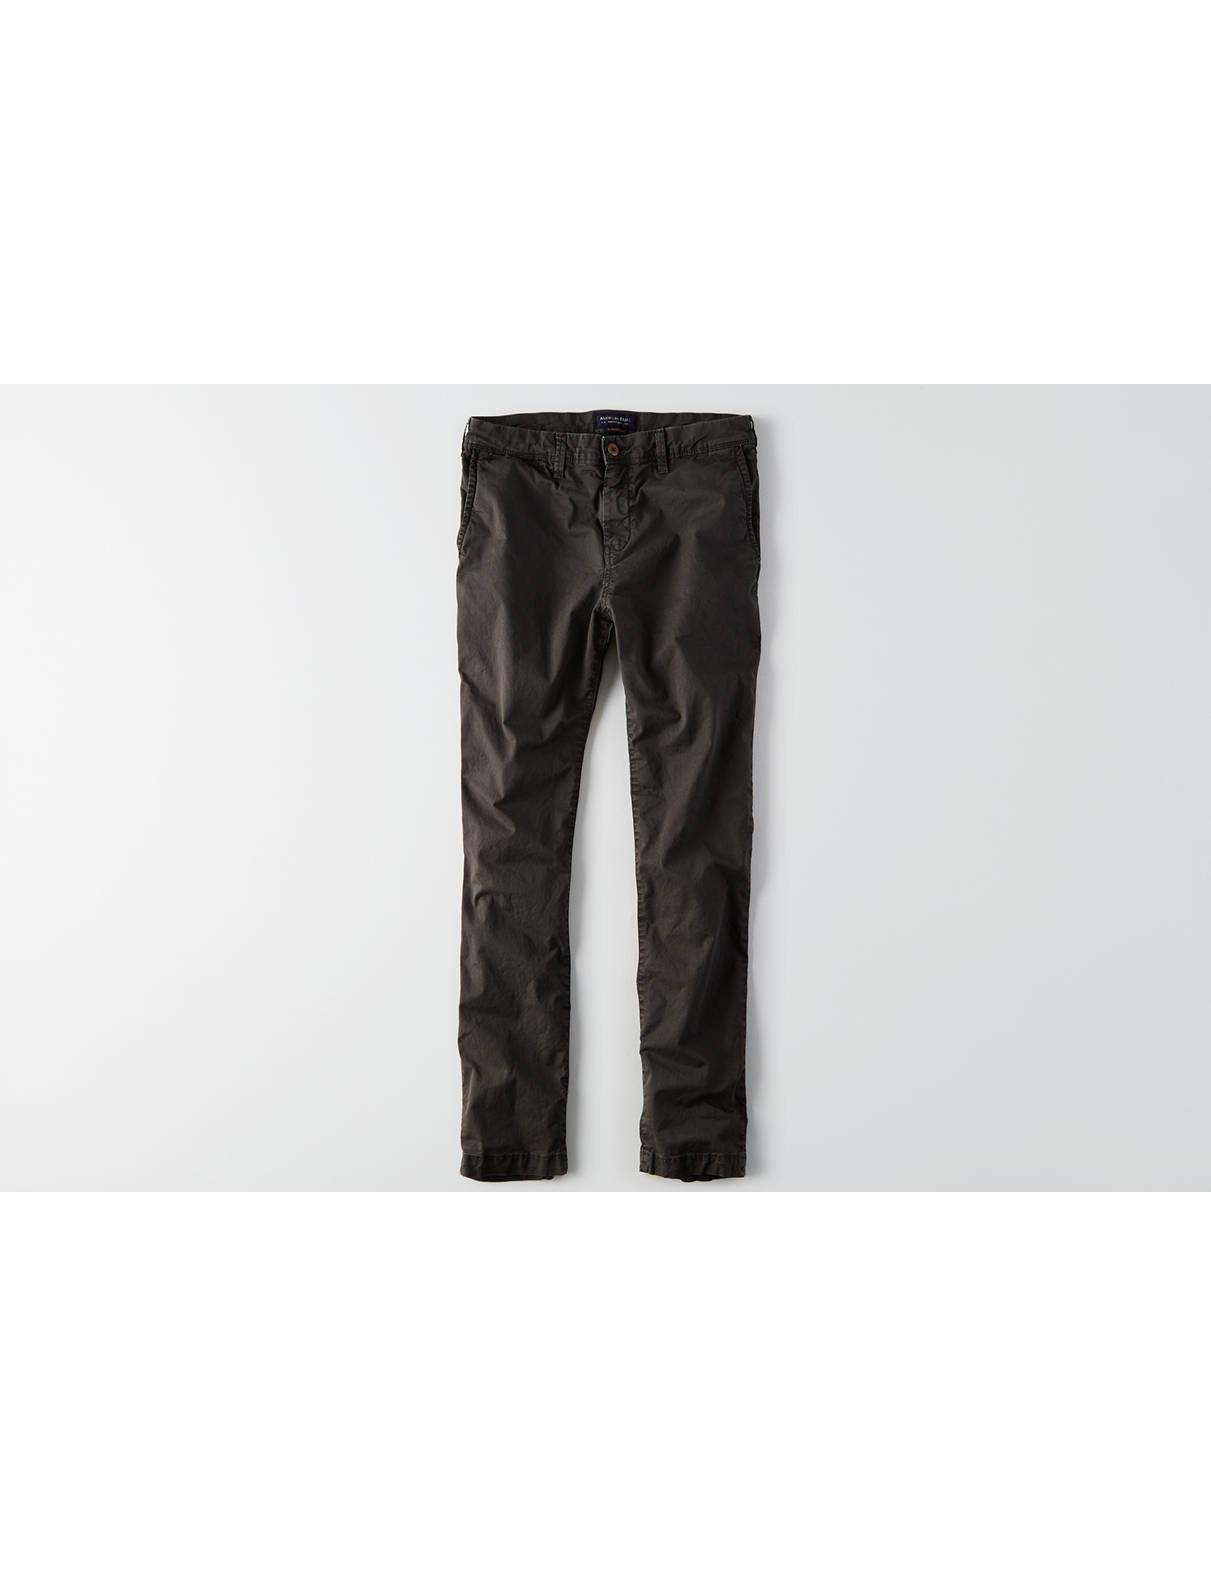 Khakis & Pants for Men | American Eagle Outfitters